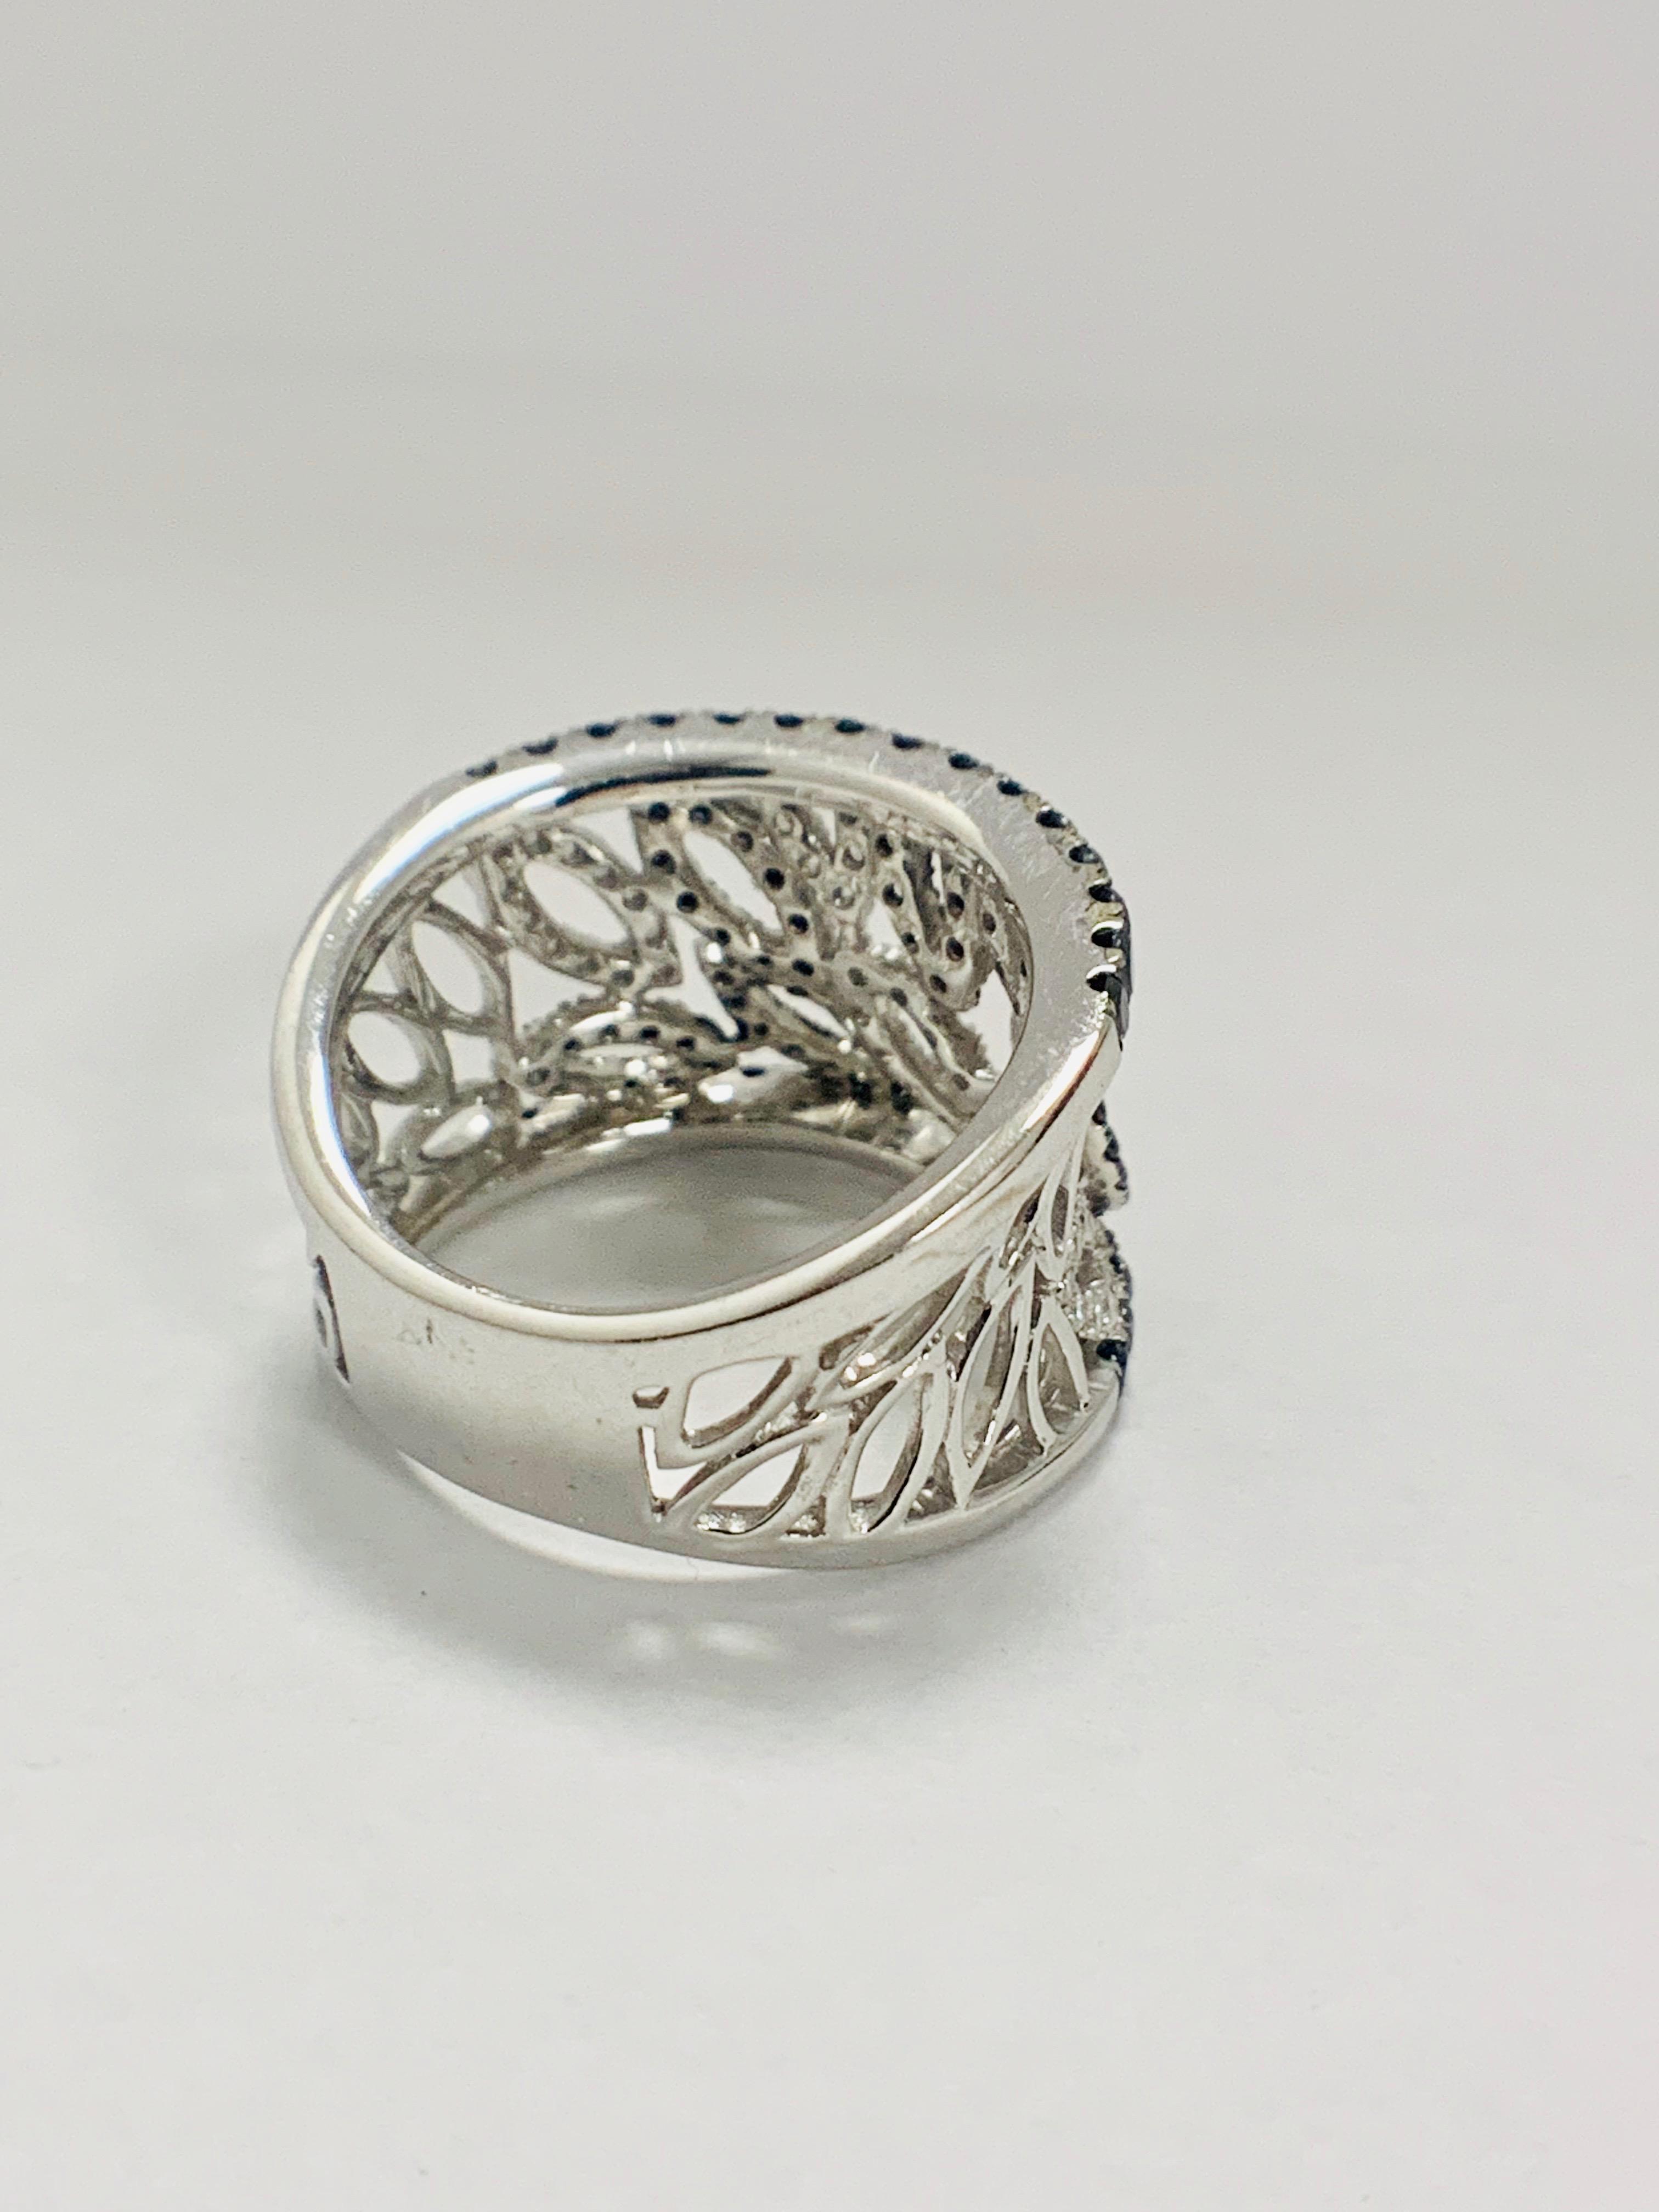 18ct White Gold Diamond ring featuring 90 round cut, black Diamonds (1.14ct TBDW) - Image 9 of 15